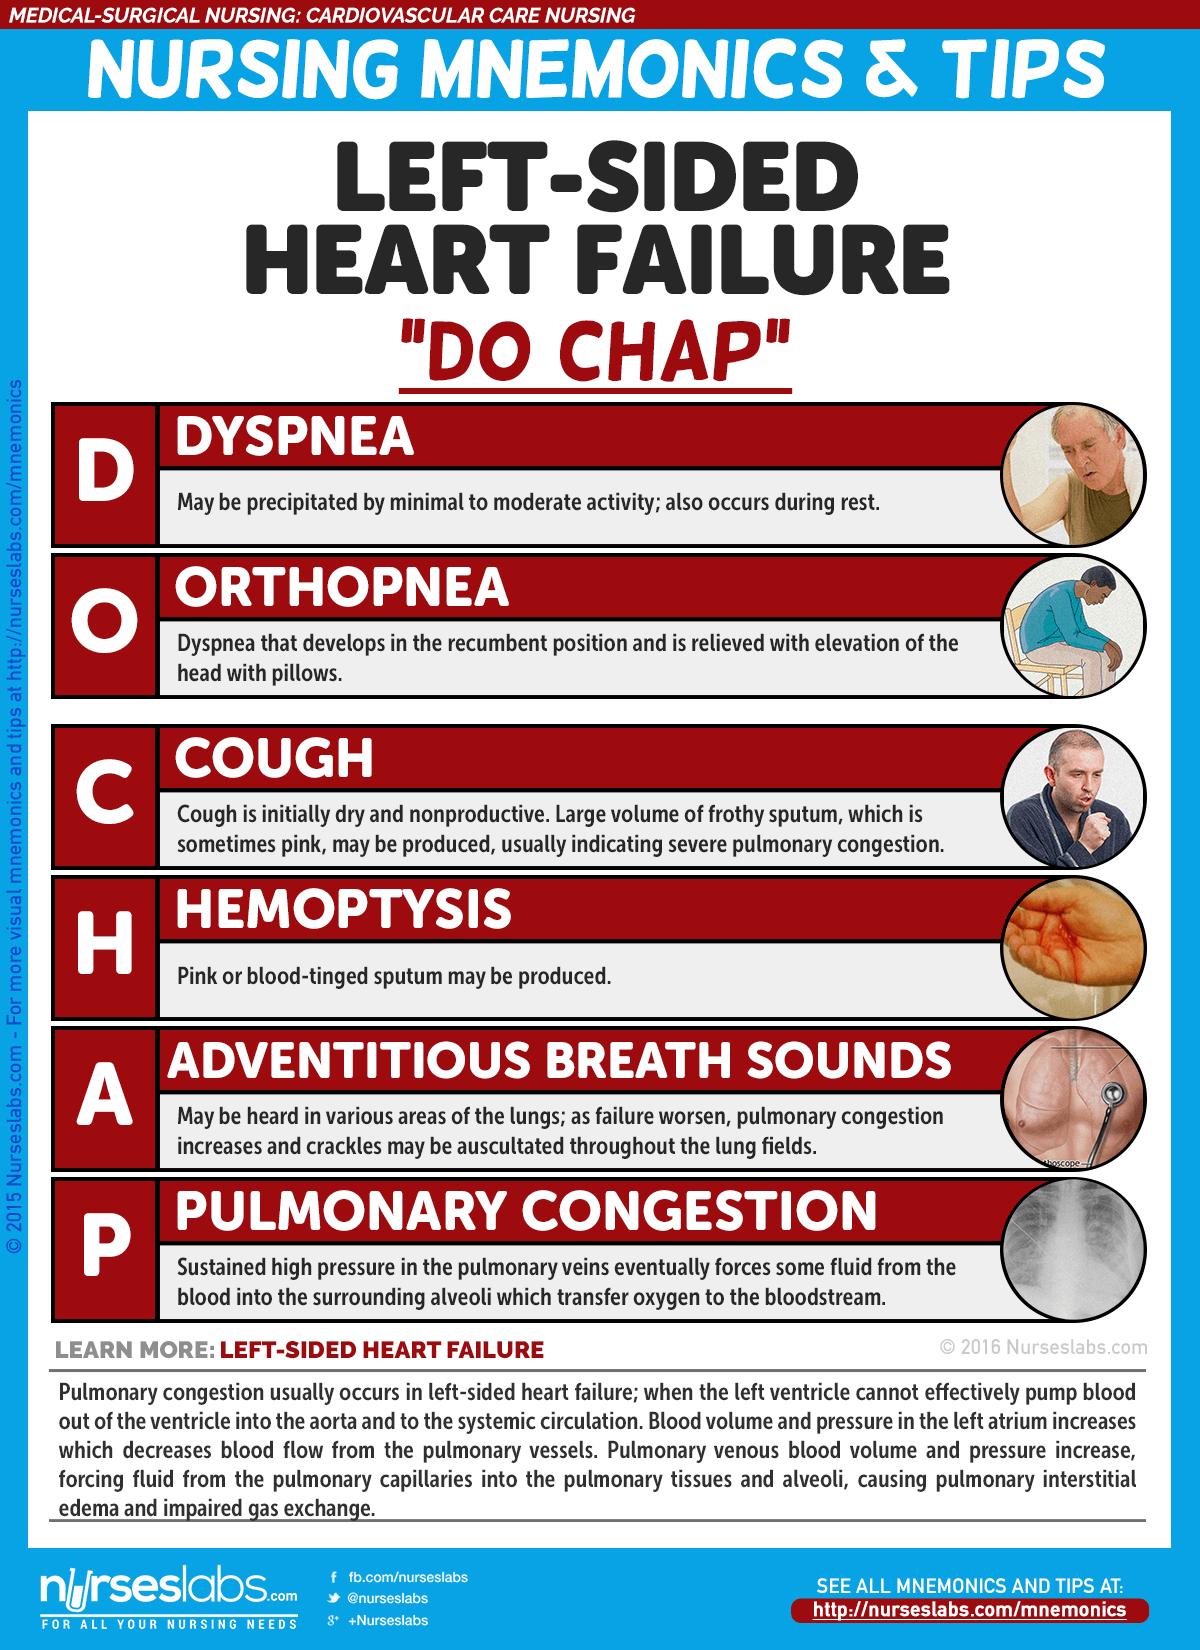 Cardiovascular Care Nursing Mnemonics and Tips   EMS Stuff